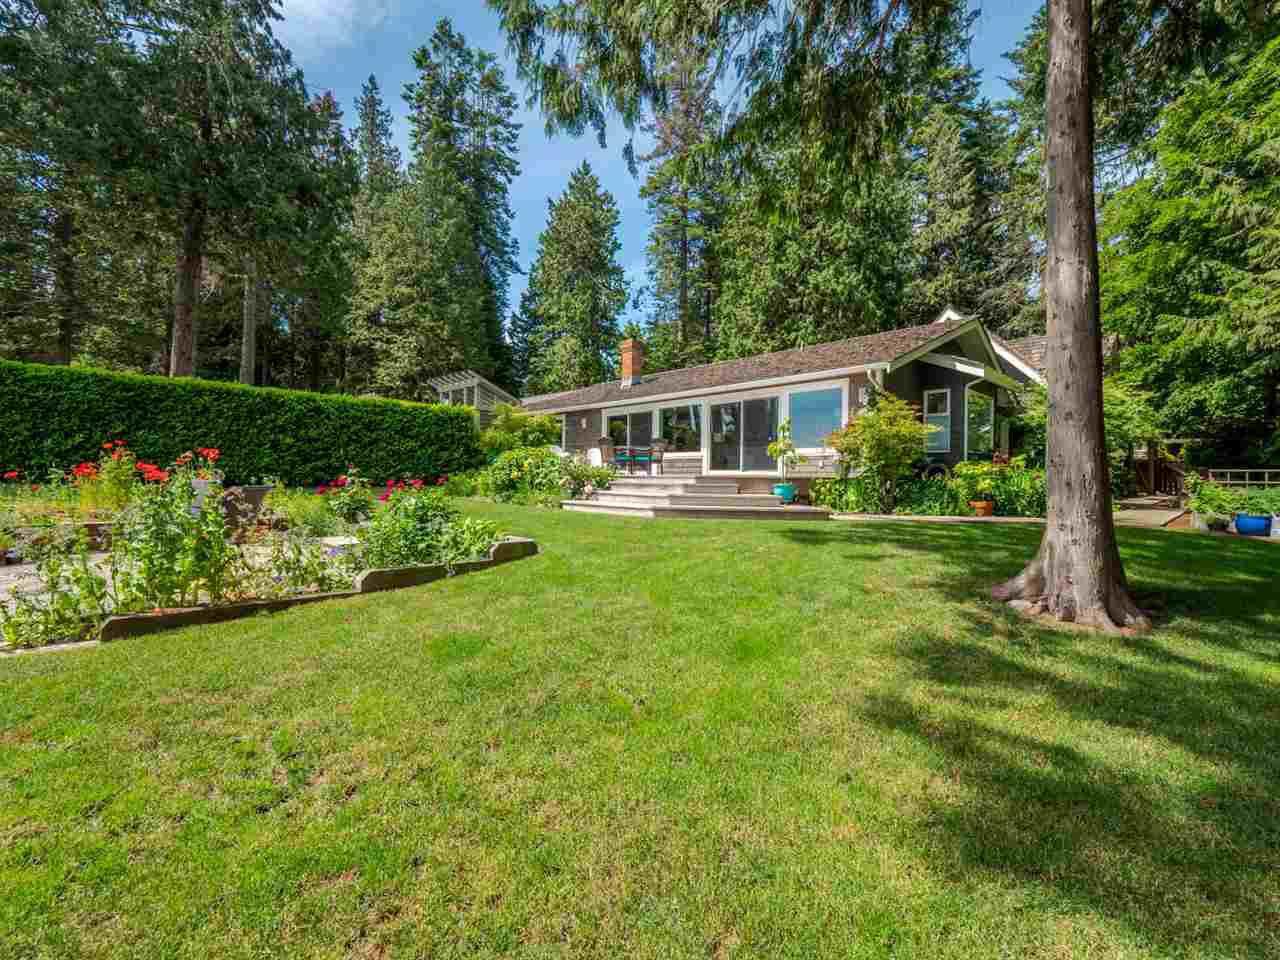 Main Photo: 7649 EUREKA Place in Halfmoon Bay: Halfmn Bay Secret Cv Redroofs House for sale (Sunshine Coast)  : MLS®# R2377267